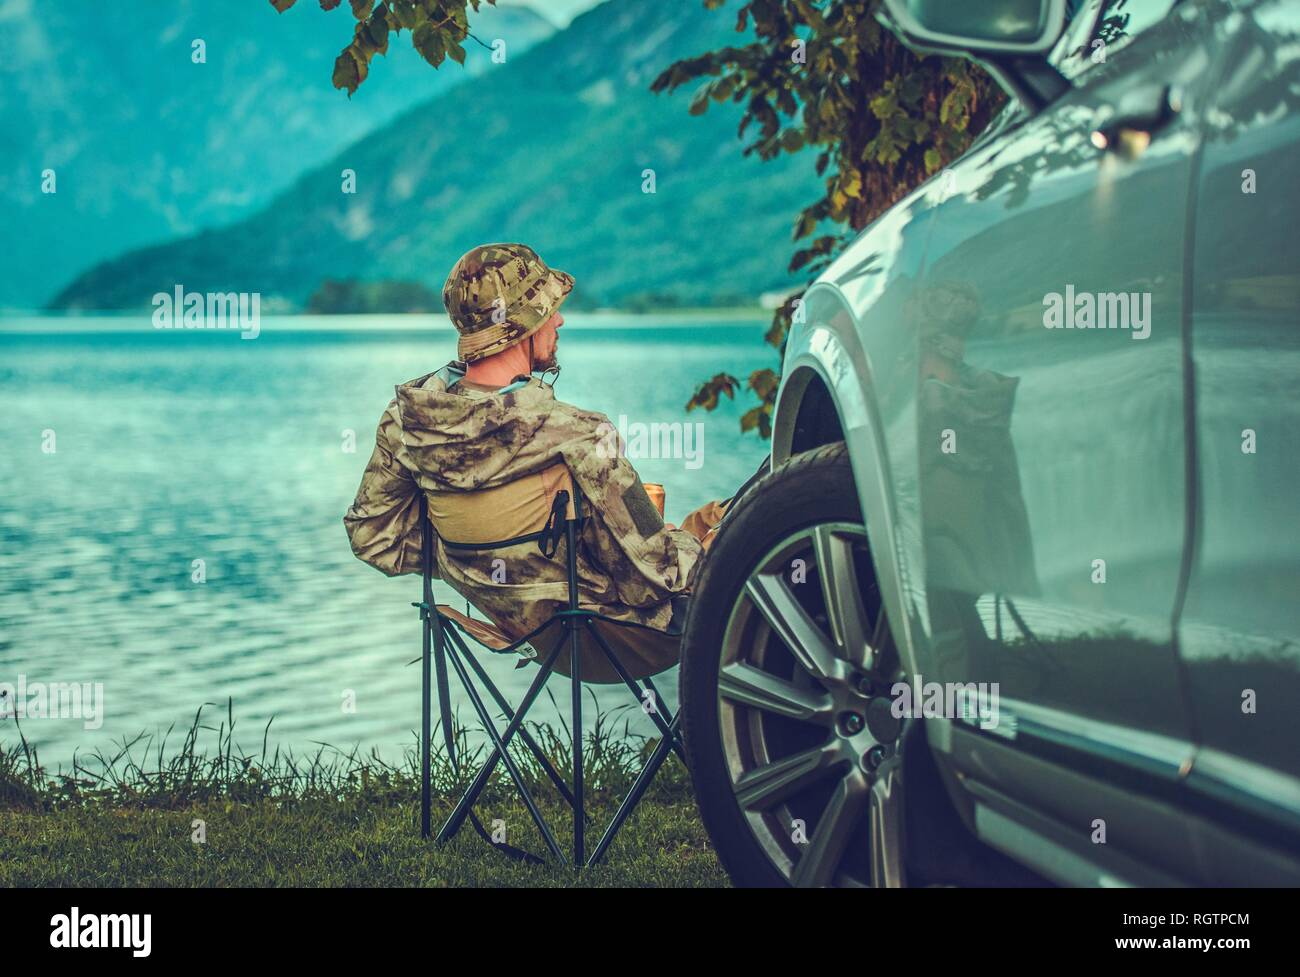 Weekend at the Lake. Caucasian Men Speeding His Free Time on the Lake Shore. Car Getaway. - Stock Image